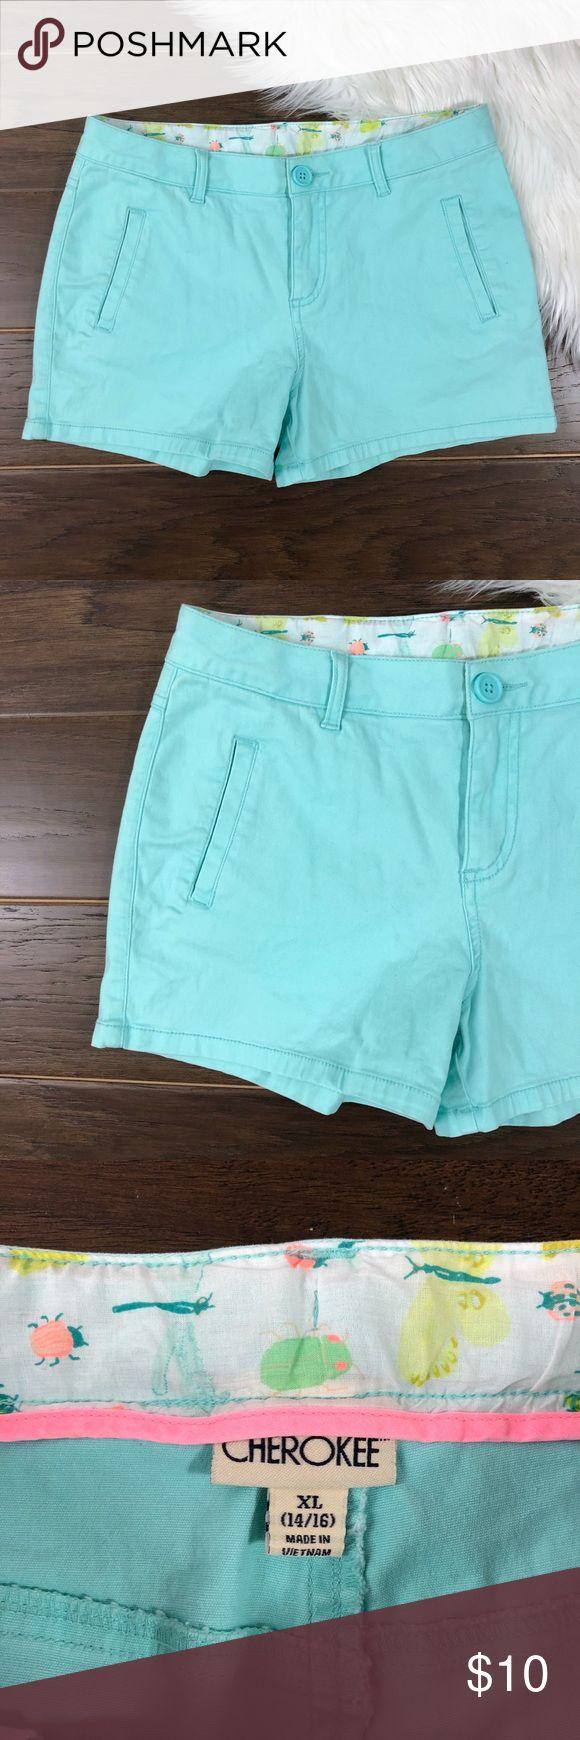 "Cherokee Juniors XL Turquoise Shorts Cherokee Juniors XL Turqoise Shorts  Condition: Excellent Measurements: Waist 28"" - Inseam 3"" - Rise 9"" - Outseam 11"" Material: 98% cotton, 2% spandex Cherokee Shorts"